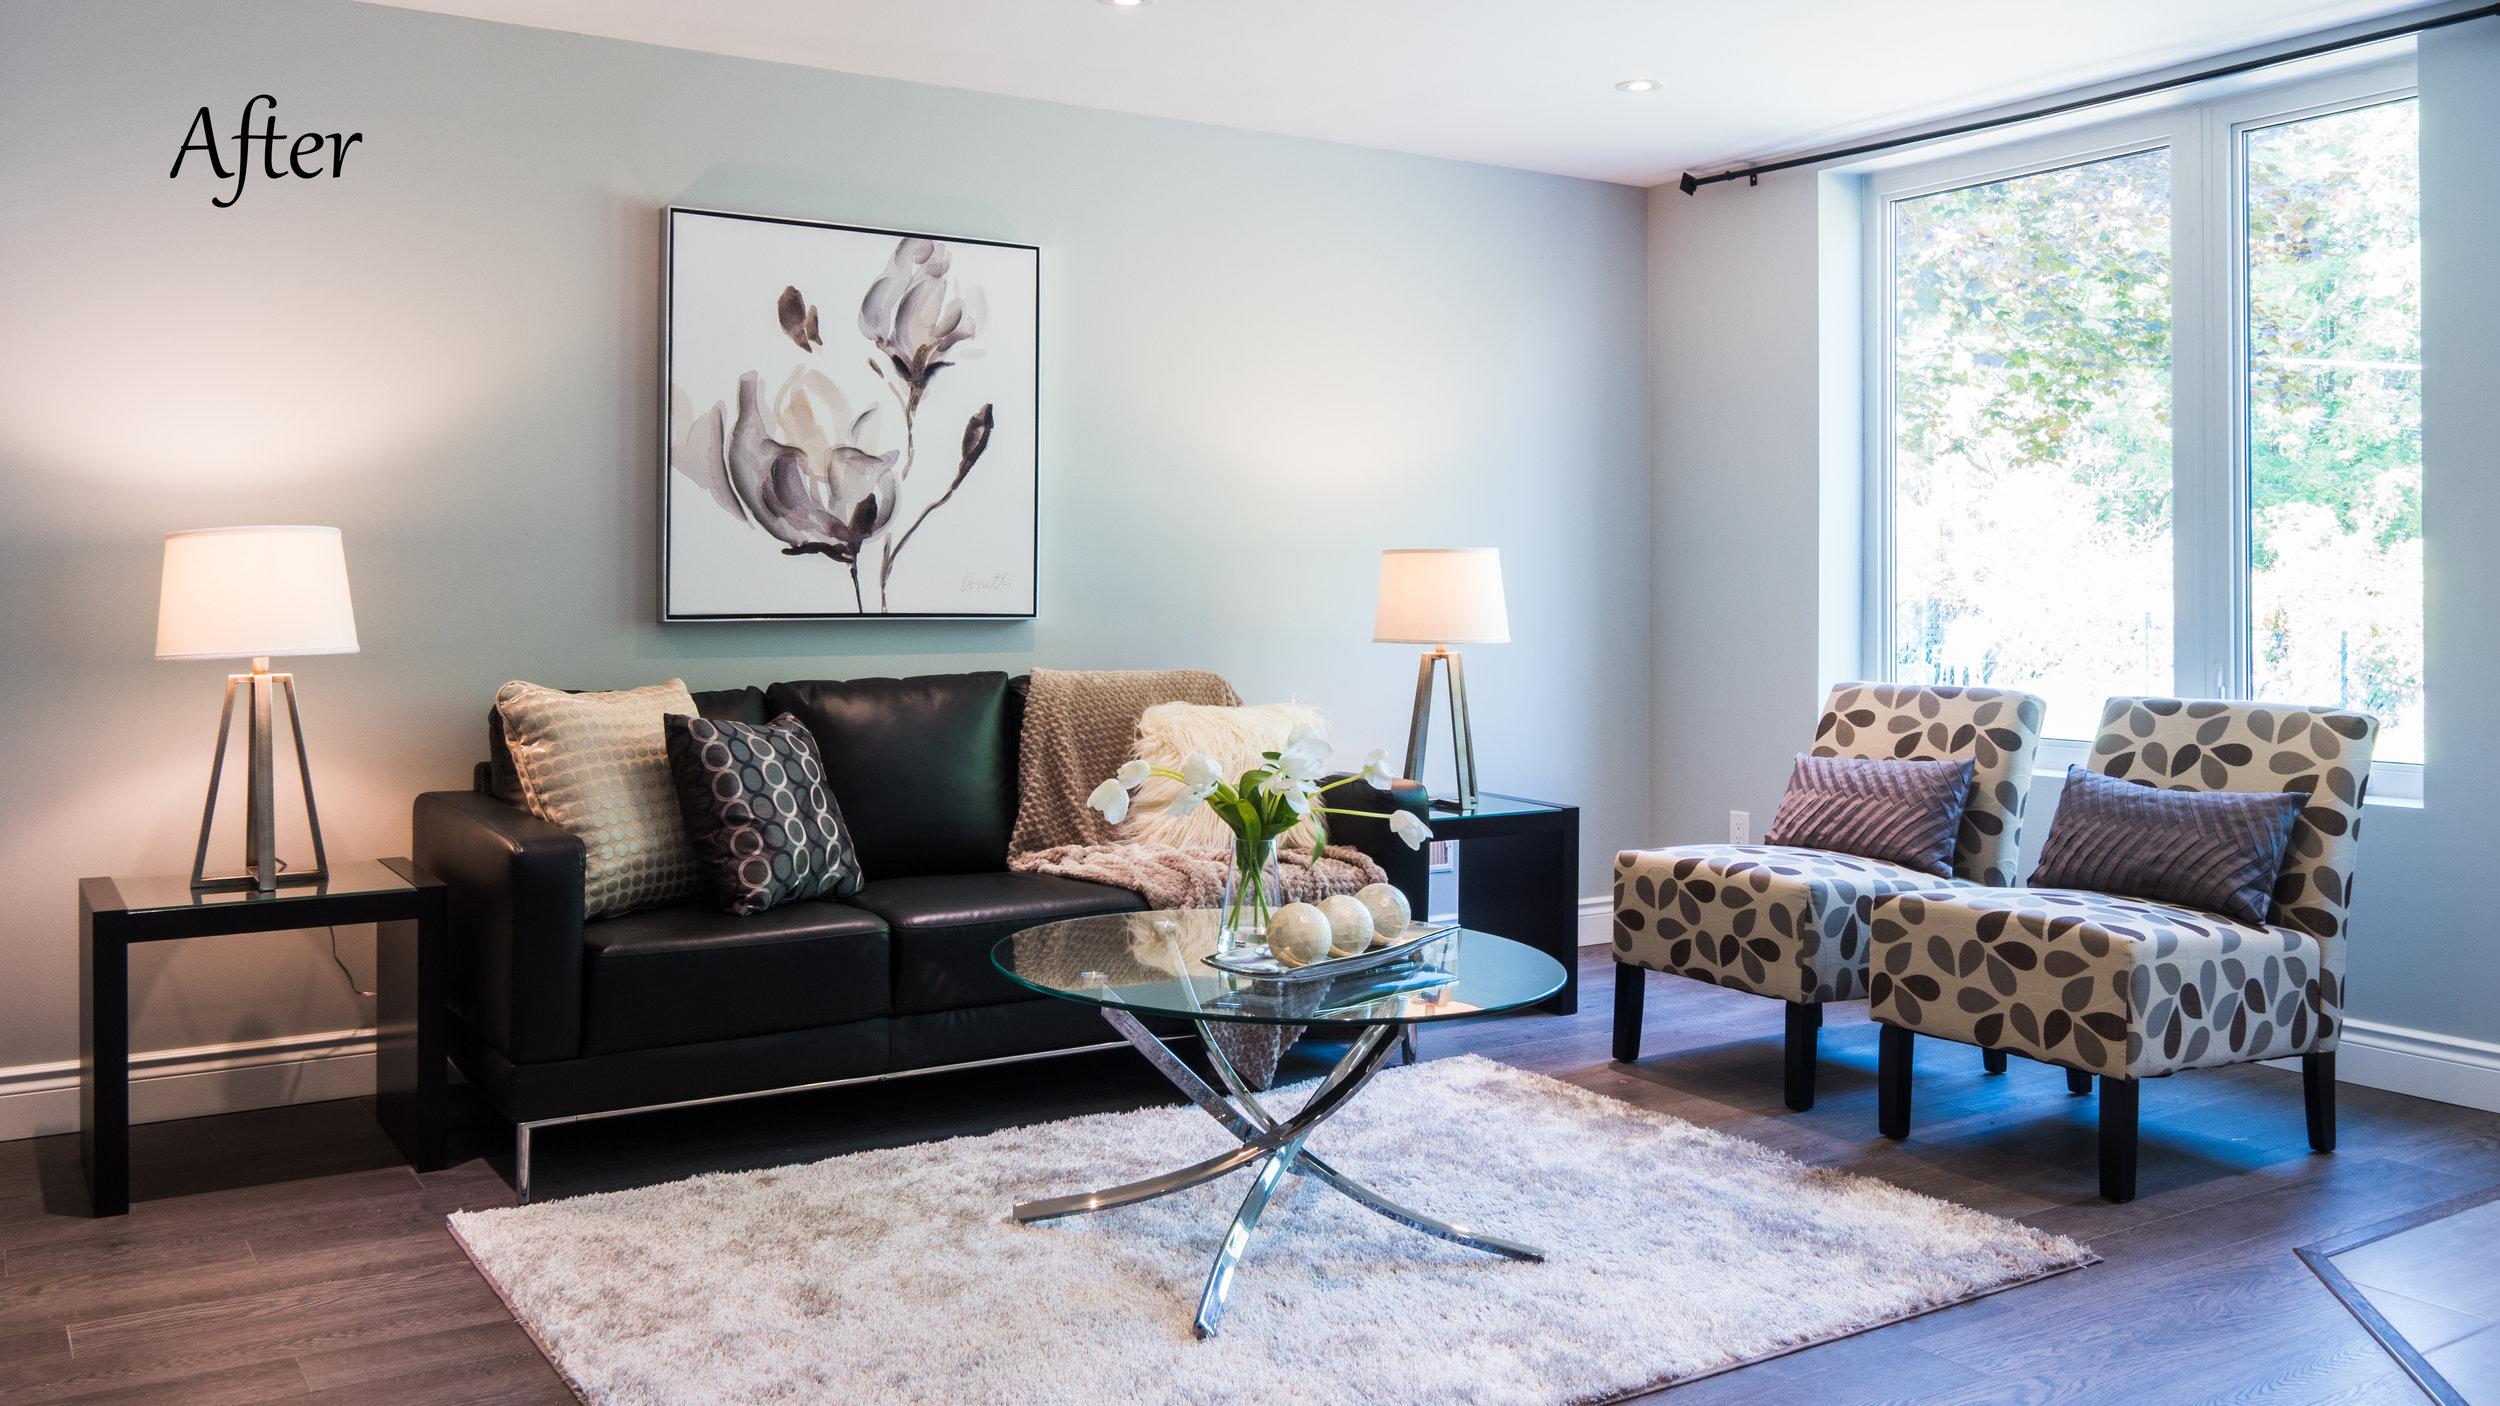 Livingroom 3 - After.jpg